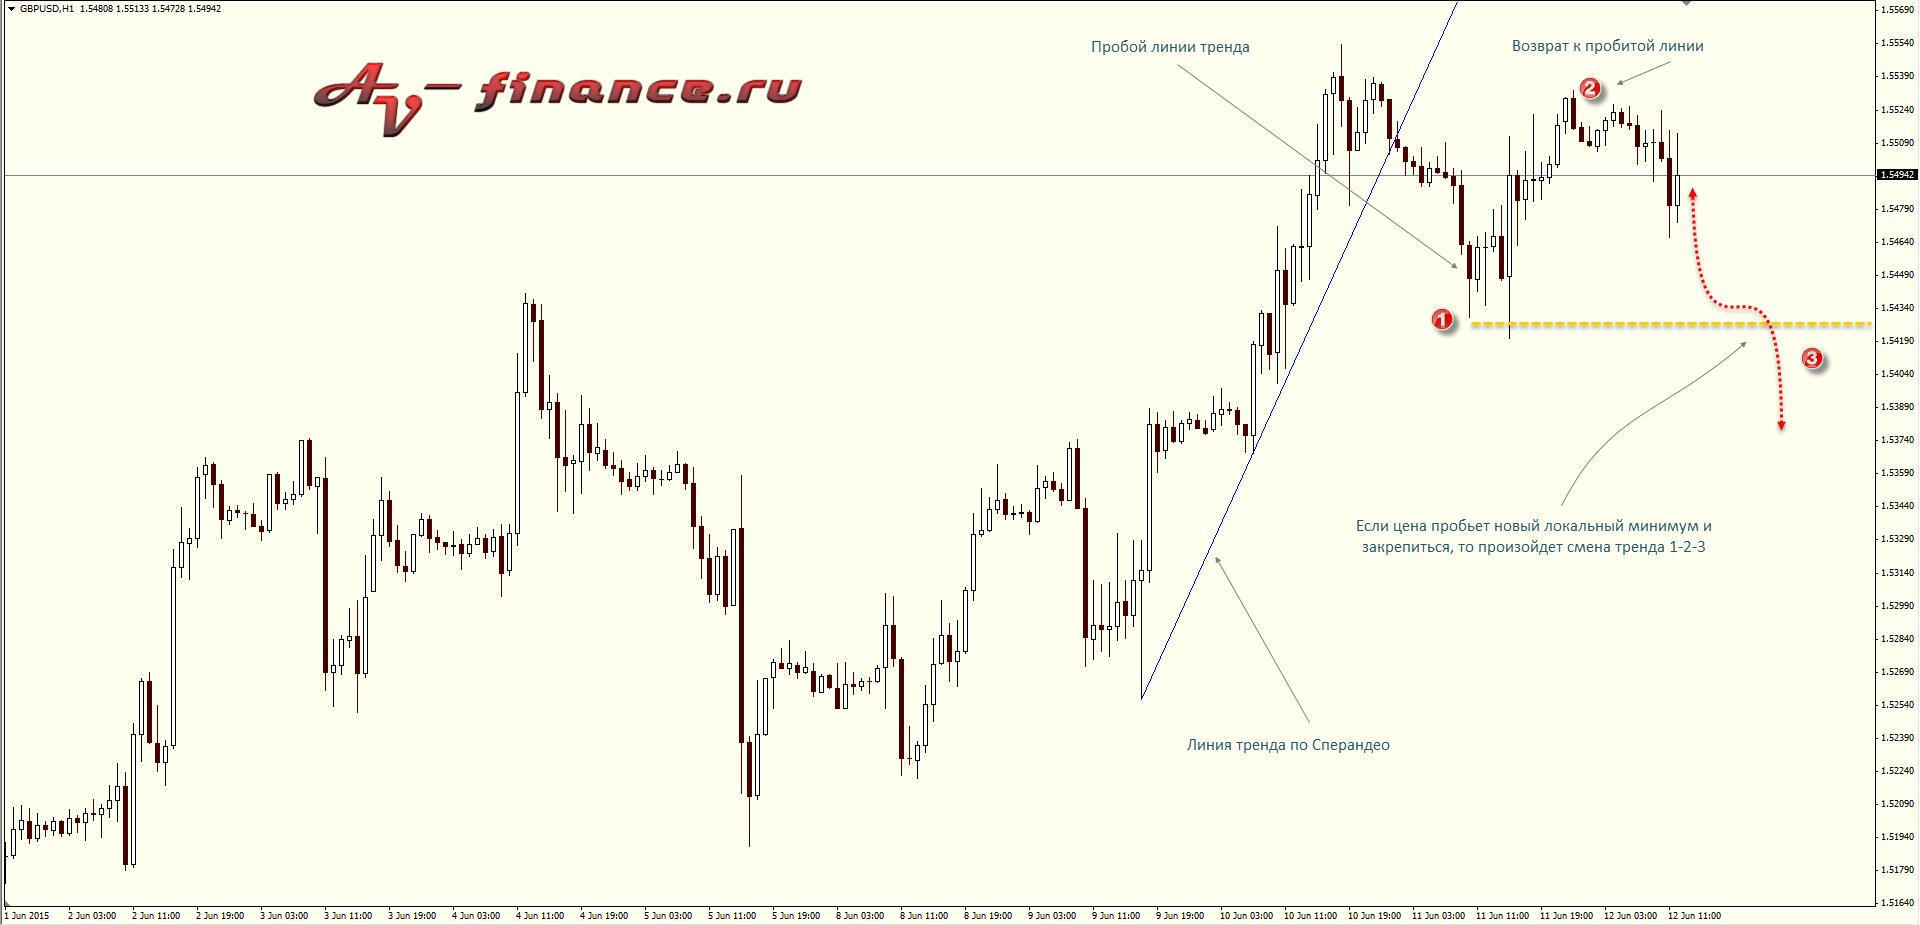 smena-trenda-na-1-2-3_1 Фигуры разворота и продолжения тренда